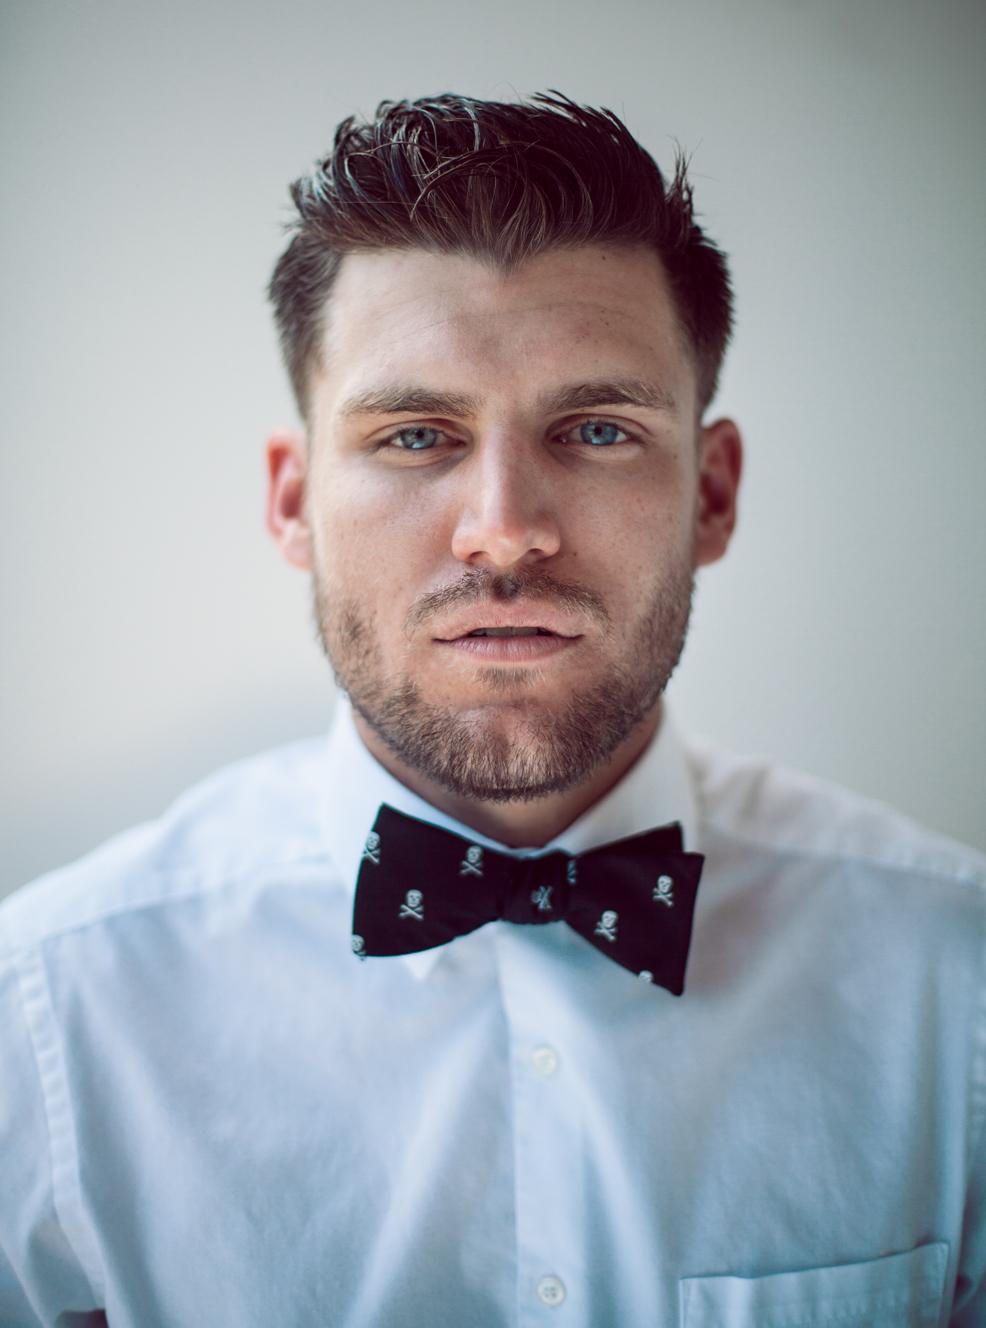 The Matthew Smith - Headshot Photographer-49.jpg